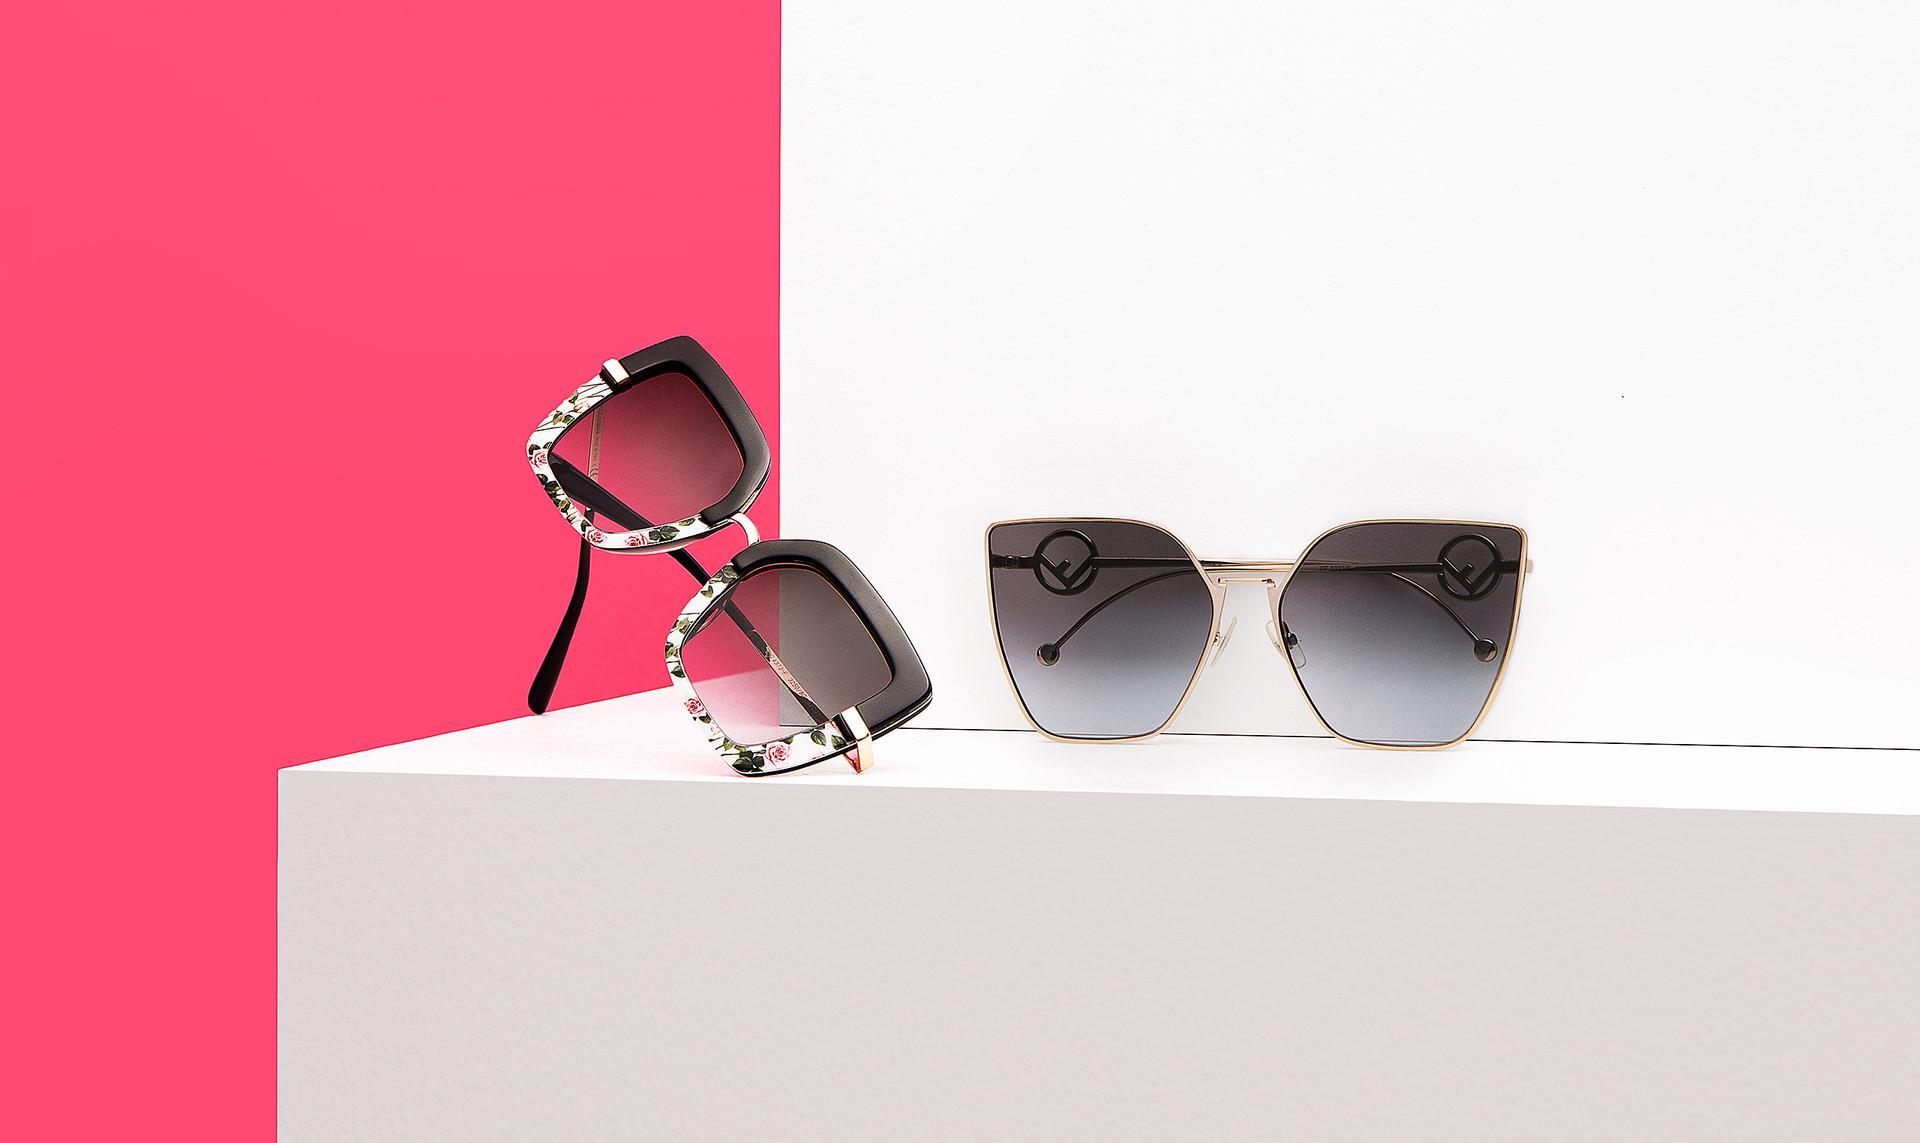 Luxury sunglass selection